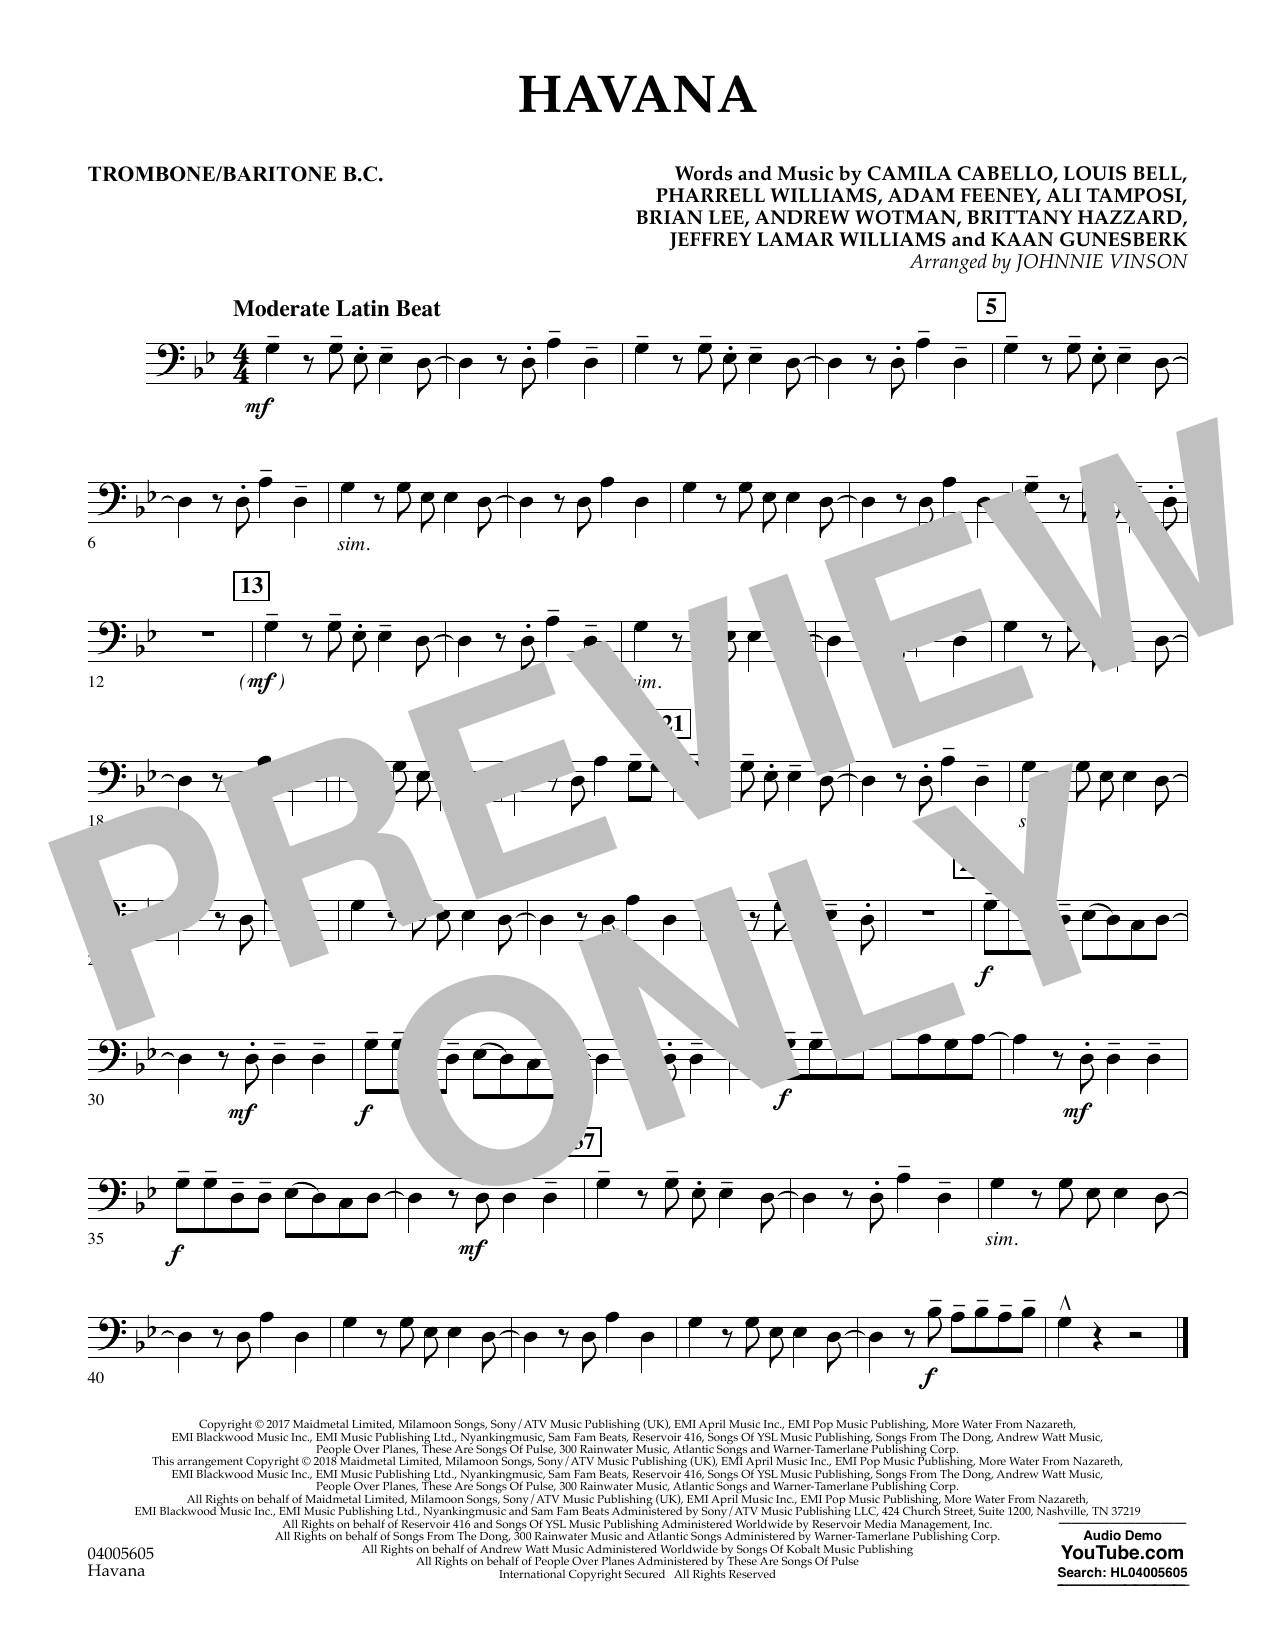 Havana - Trombone/Baritone B.C. (Concert Band)